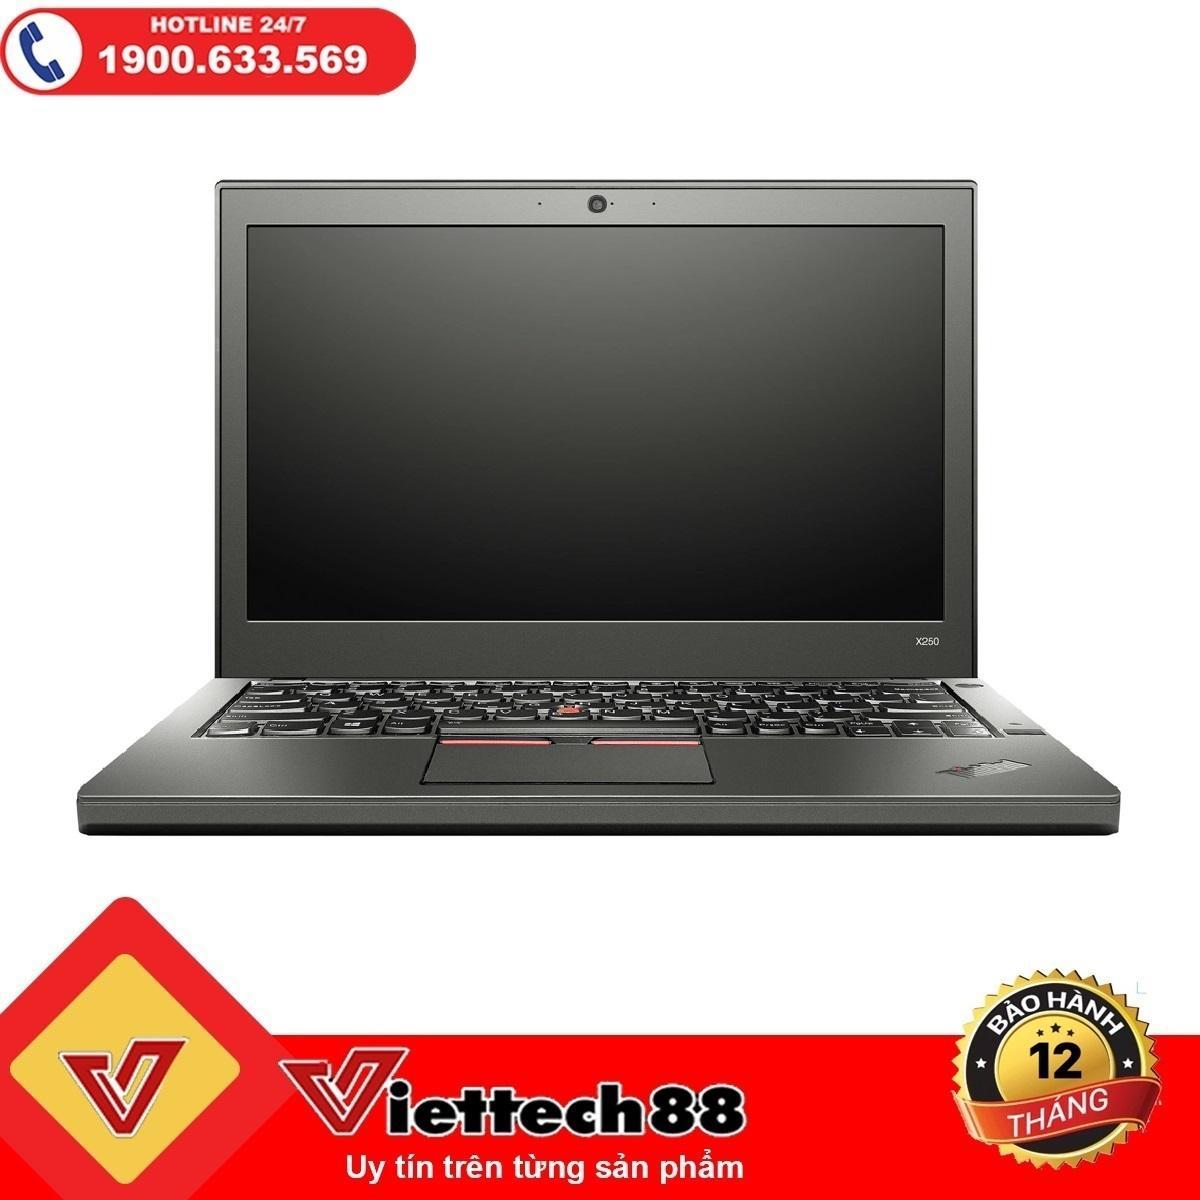 "Lazada Giảm Giá Khi Mua Laptop Lenovo Thinkpad X260 Core I5 6300U/ Ram 8Gb/ SSD 256Gb/ Màn 12.5"" HD"